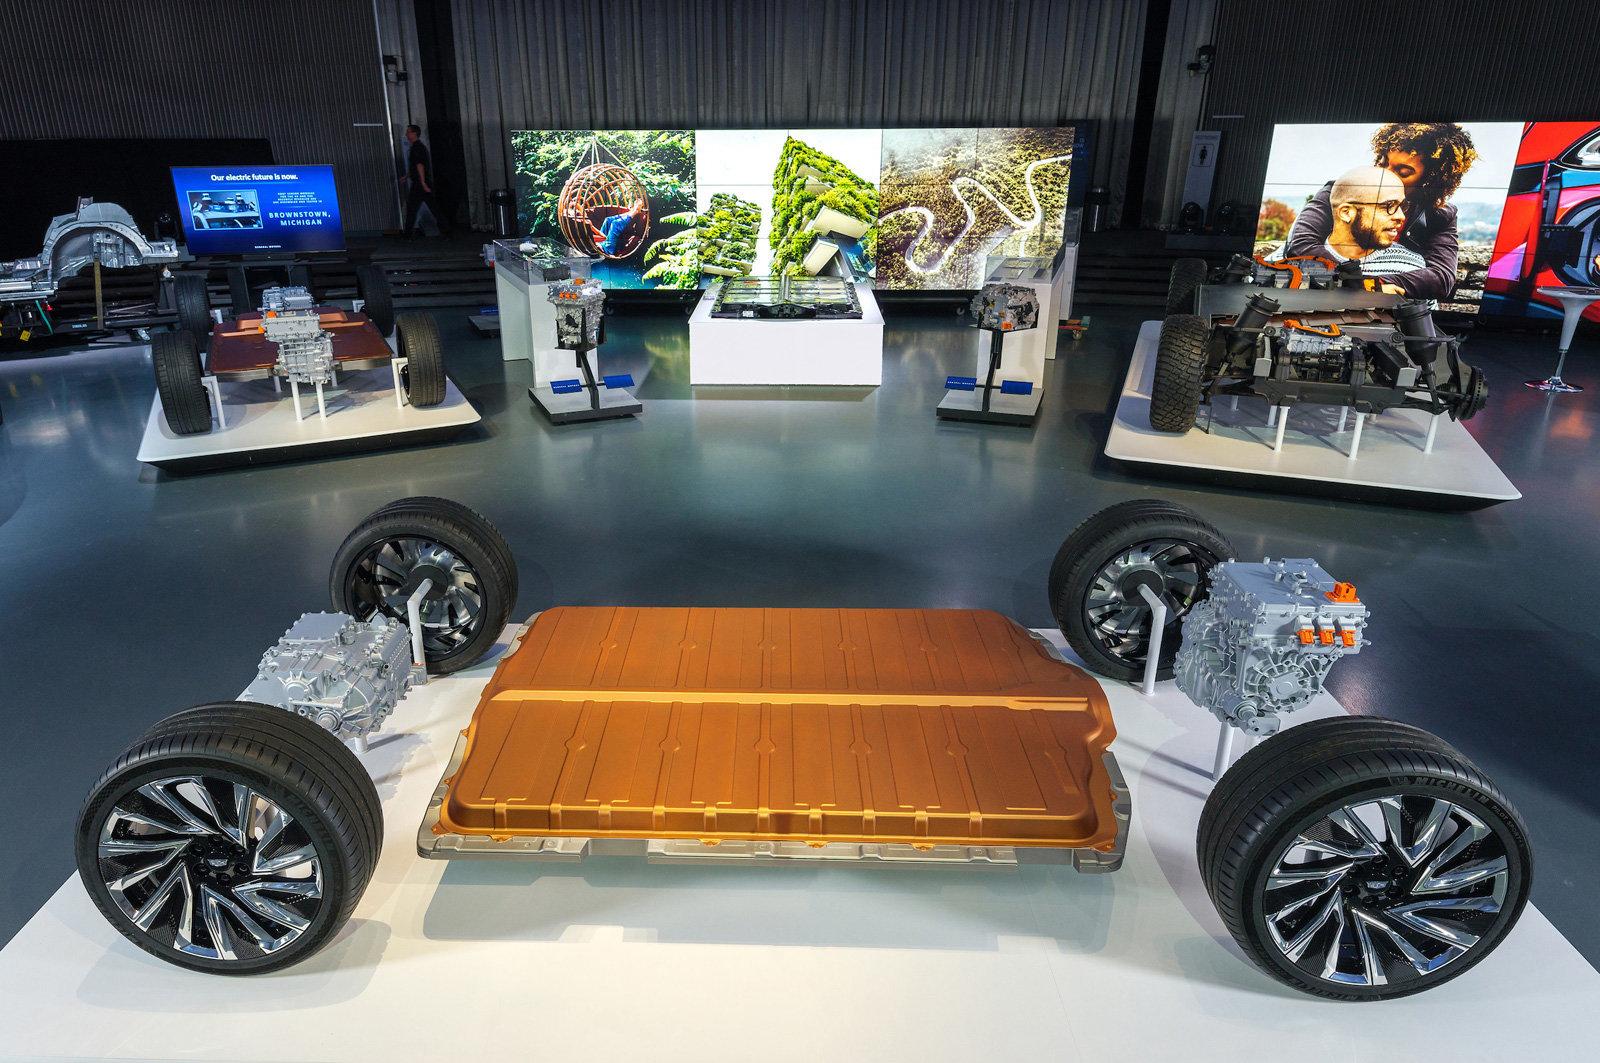 GM's cheaper, adaptable Ultium batteries are key to its EV future通用汽车的廉价、适应性强的Ultium电池是其电动汽车未来的关键